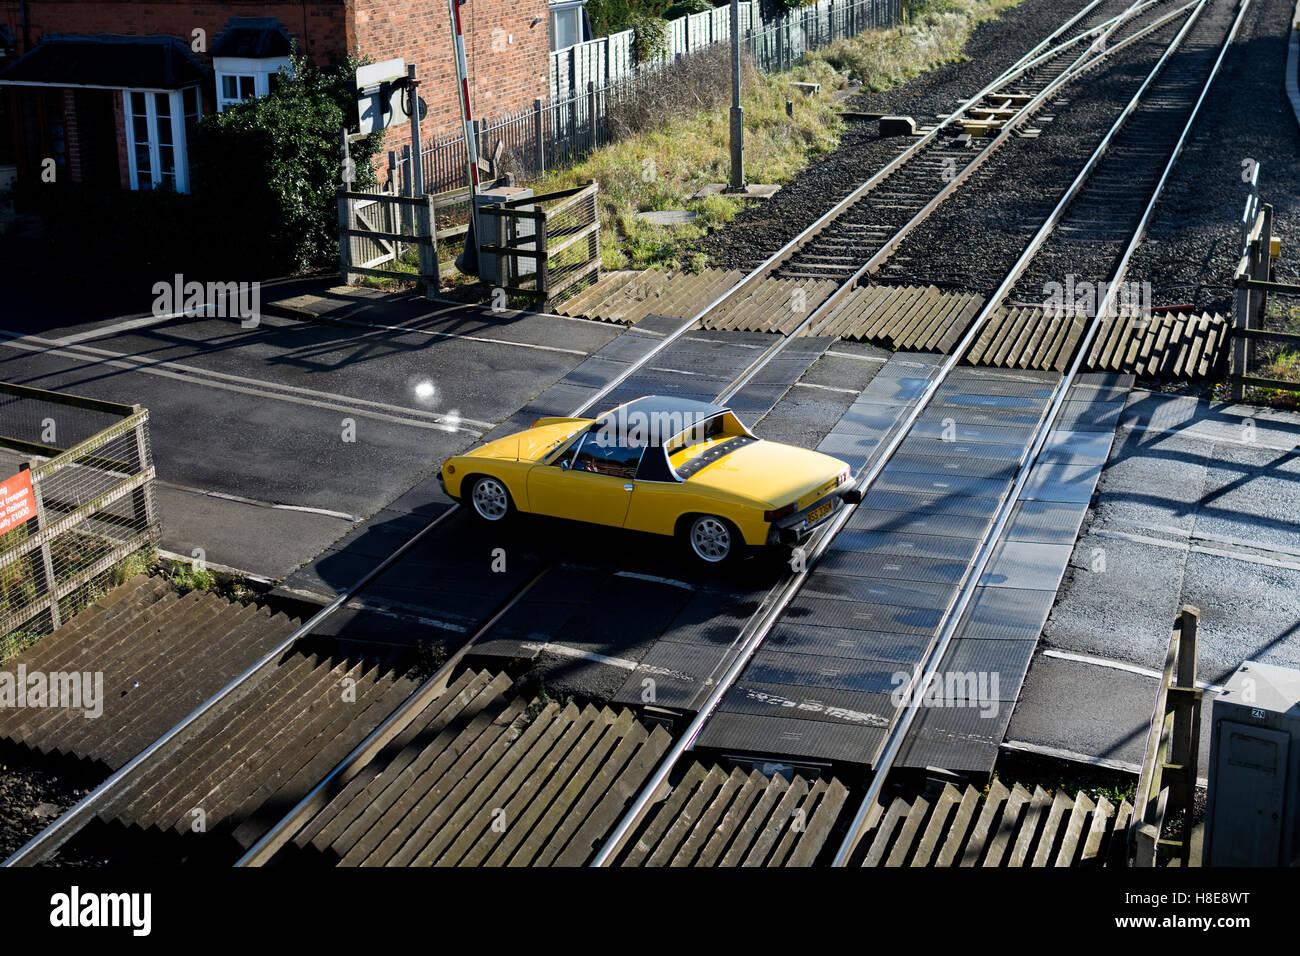 A Car At Bentley Heath Railway Level Crossing West Midlands Stock